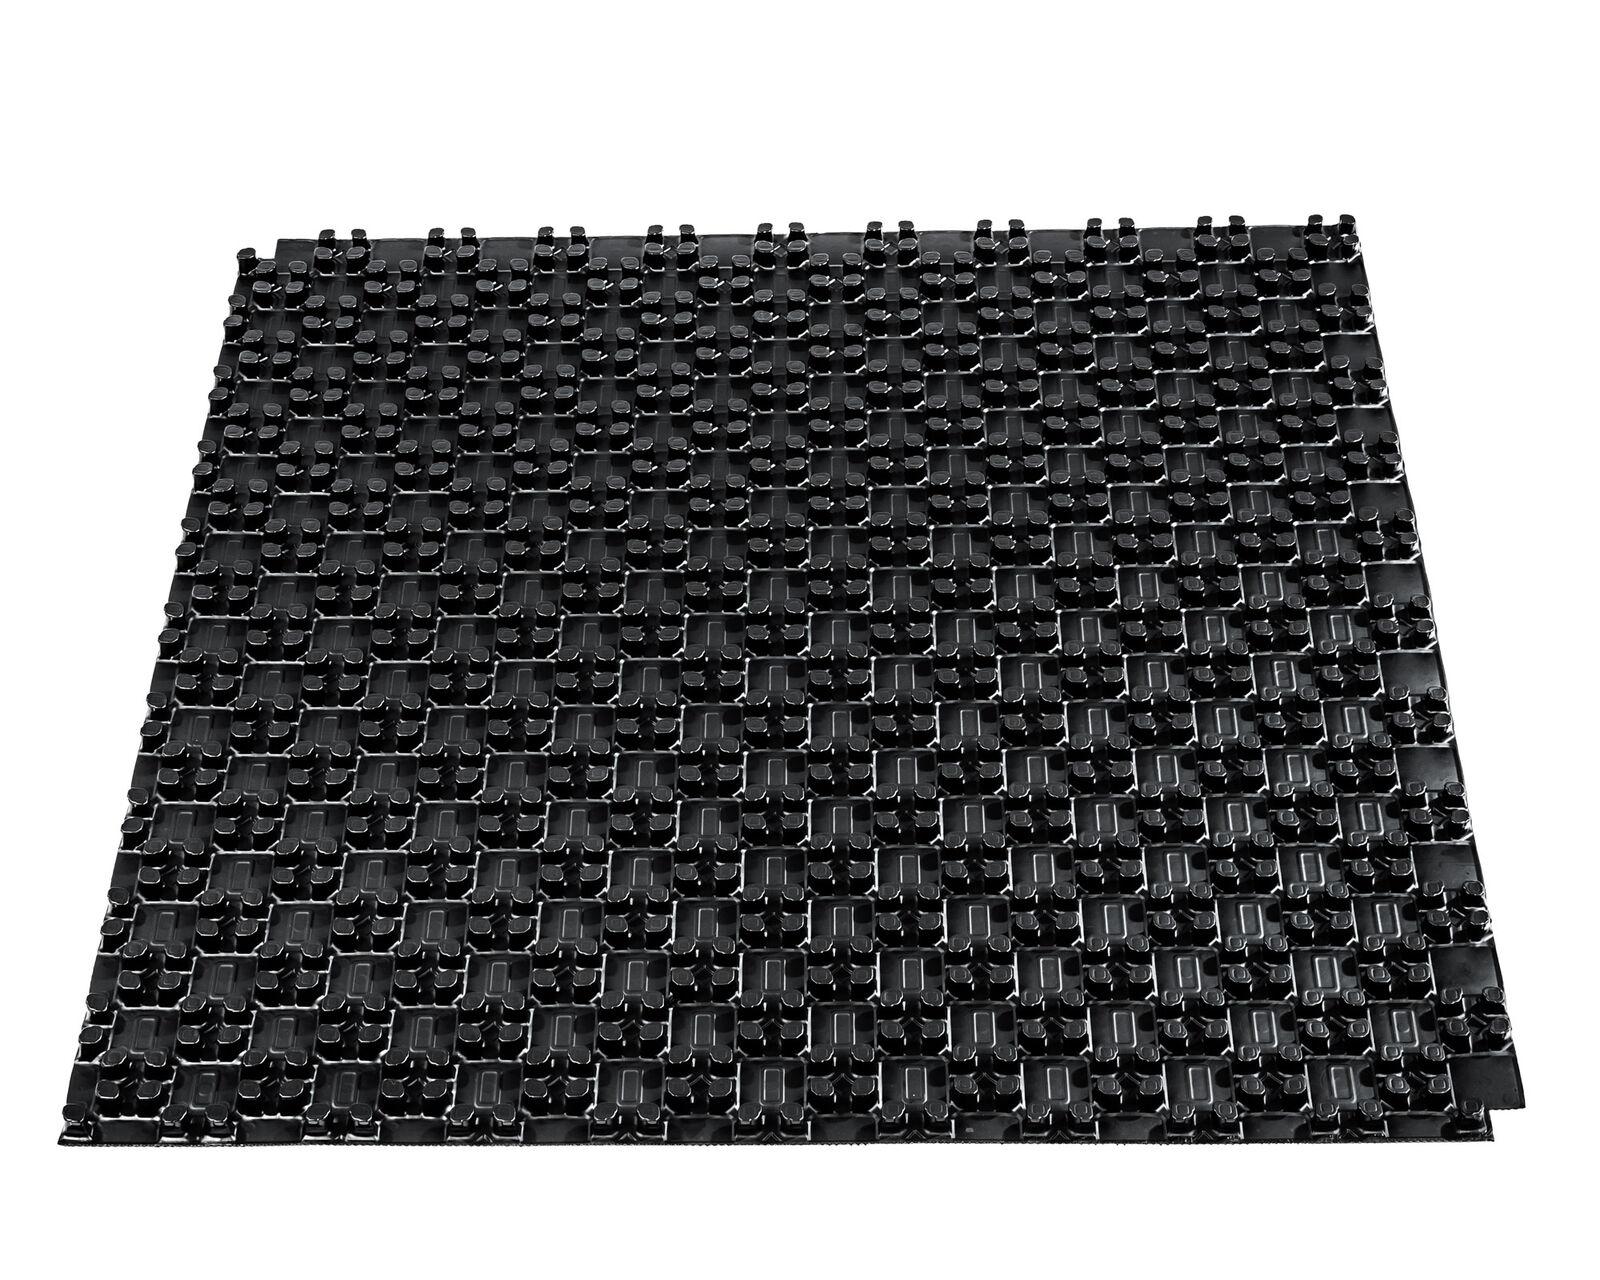 20 m² Rohrträger-/Noppenplatte / Noppenelement ohne Dämmung